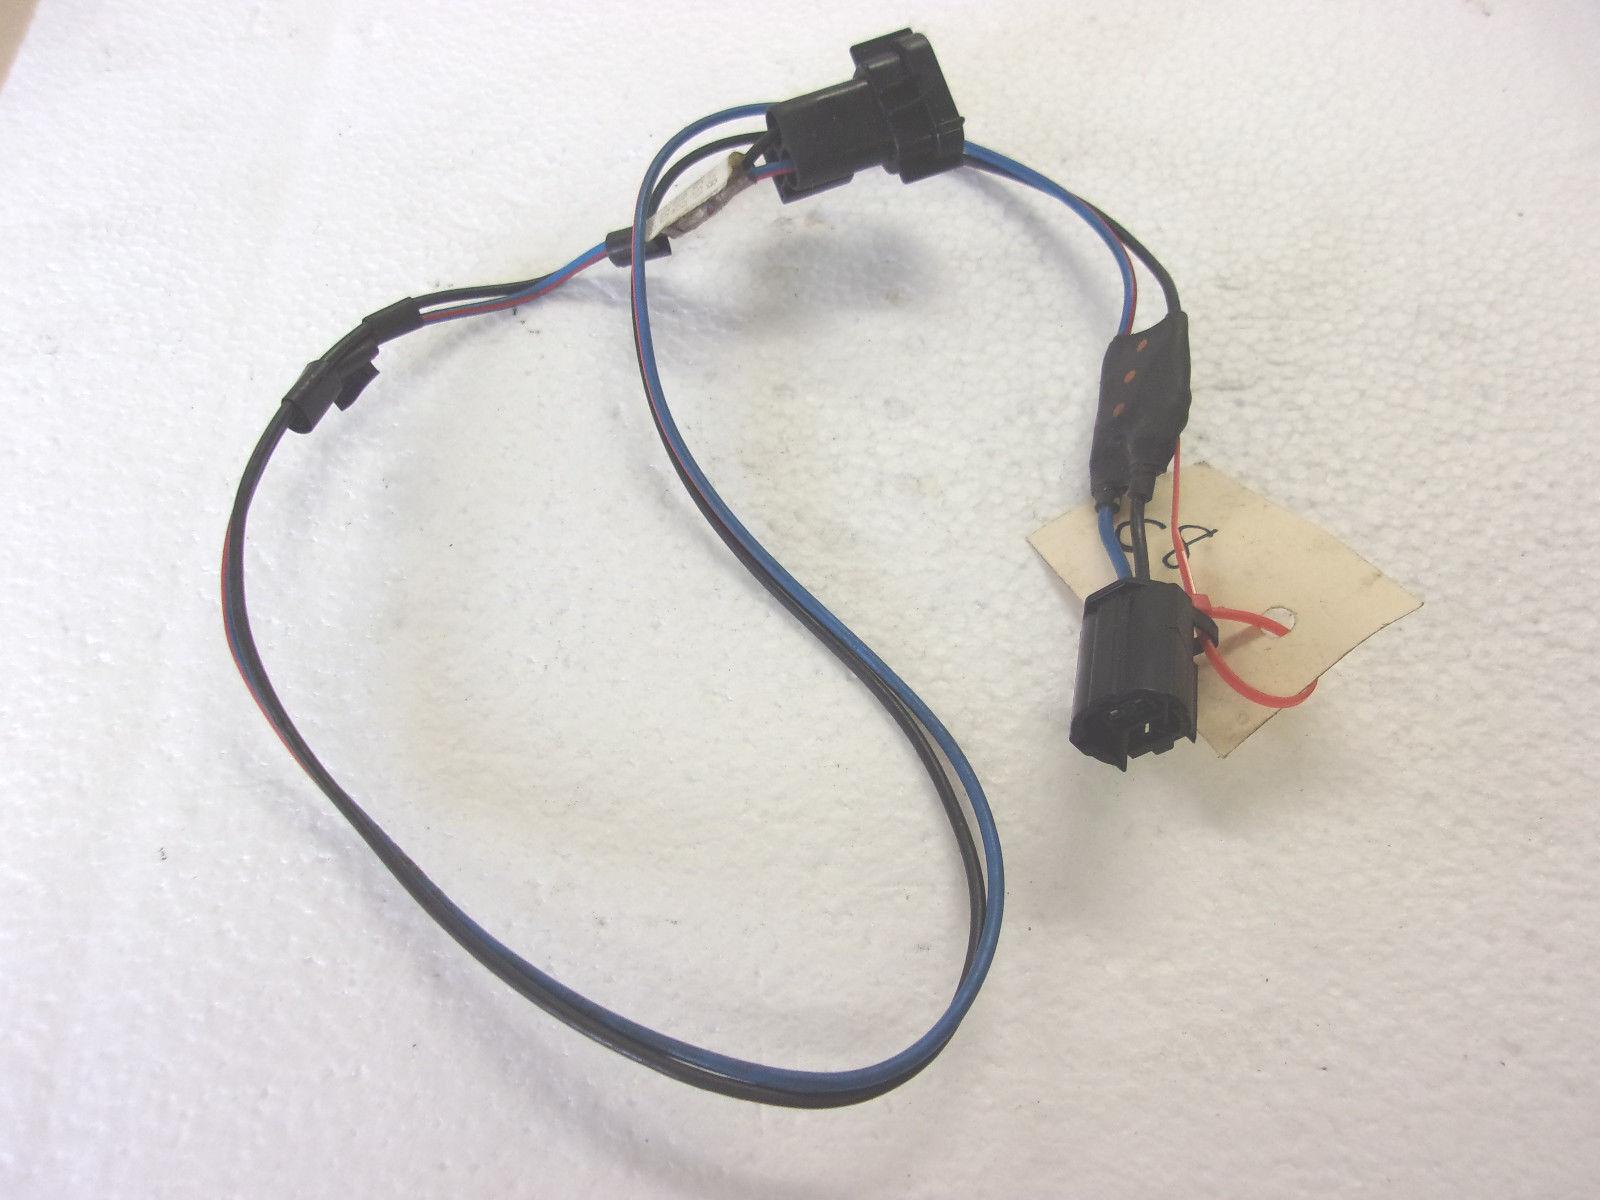 1991 Jaguar Xjs Wiring Harness - Wiring Schematics on